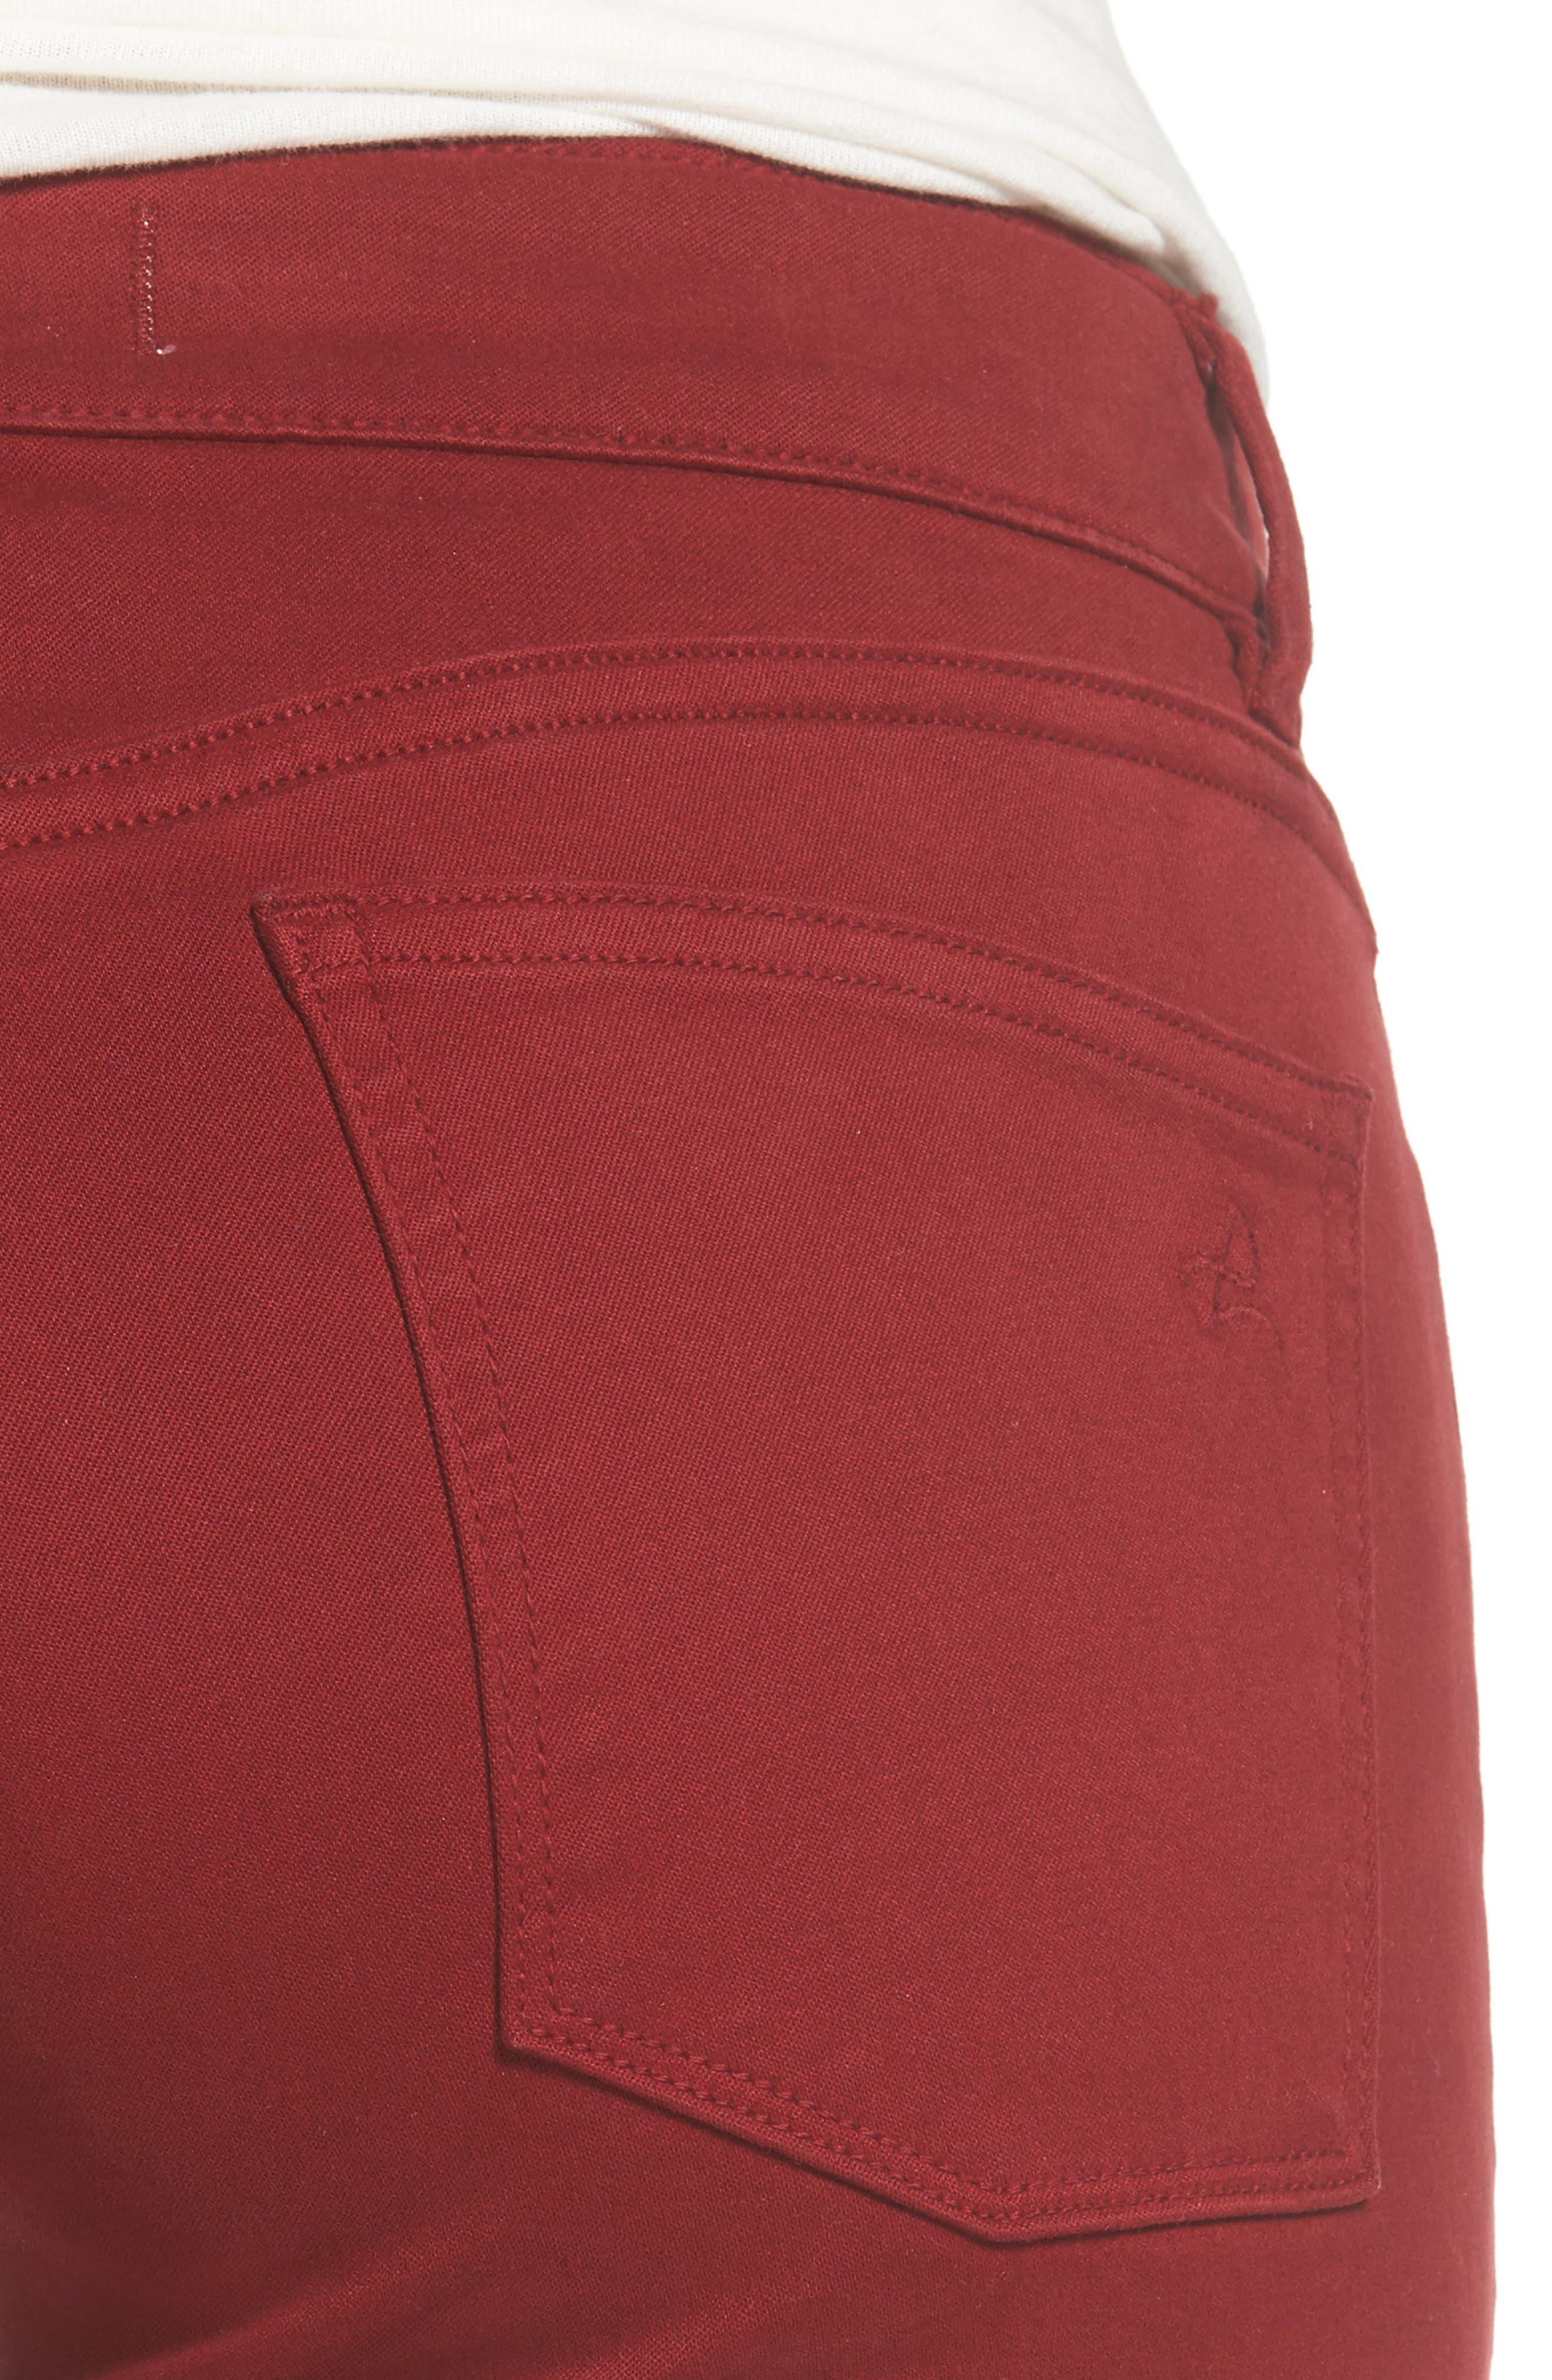 Emma Power Legging Jeans,                             Alternate thumbnail 4, color,                             Rhubarb